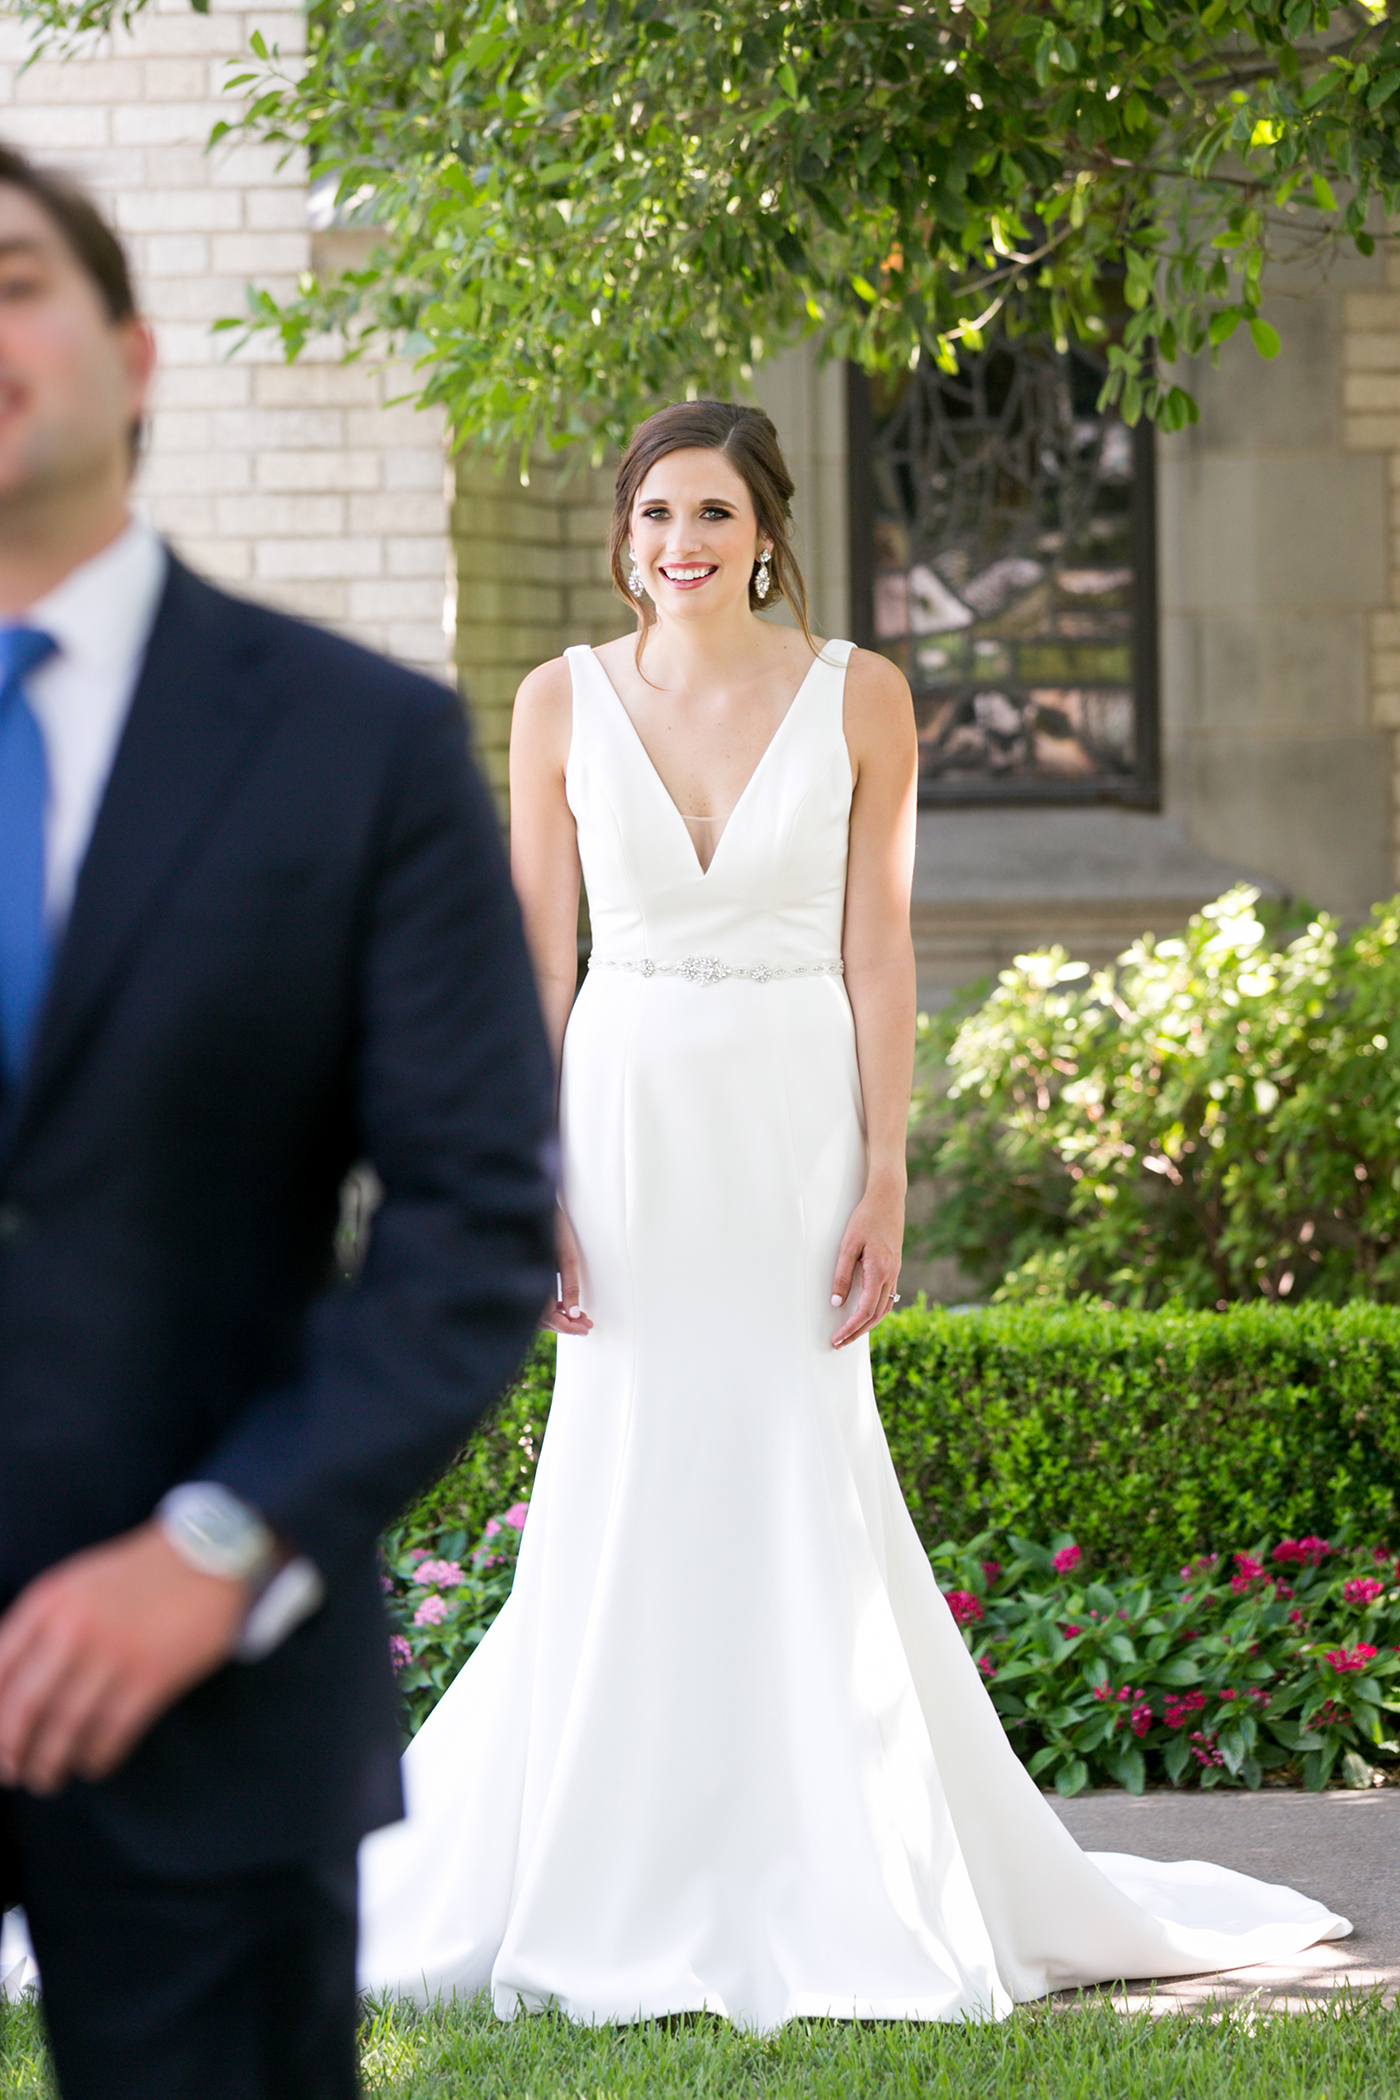 Wedding Planner Dallas TX - Allday Events - Highland Park - Marie Gabrielle Wedding - 153.jpg